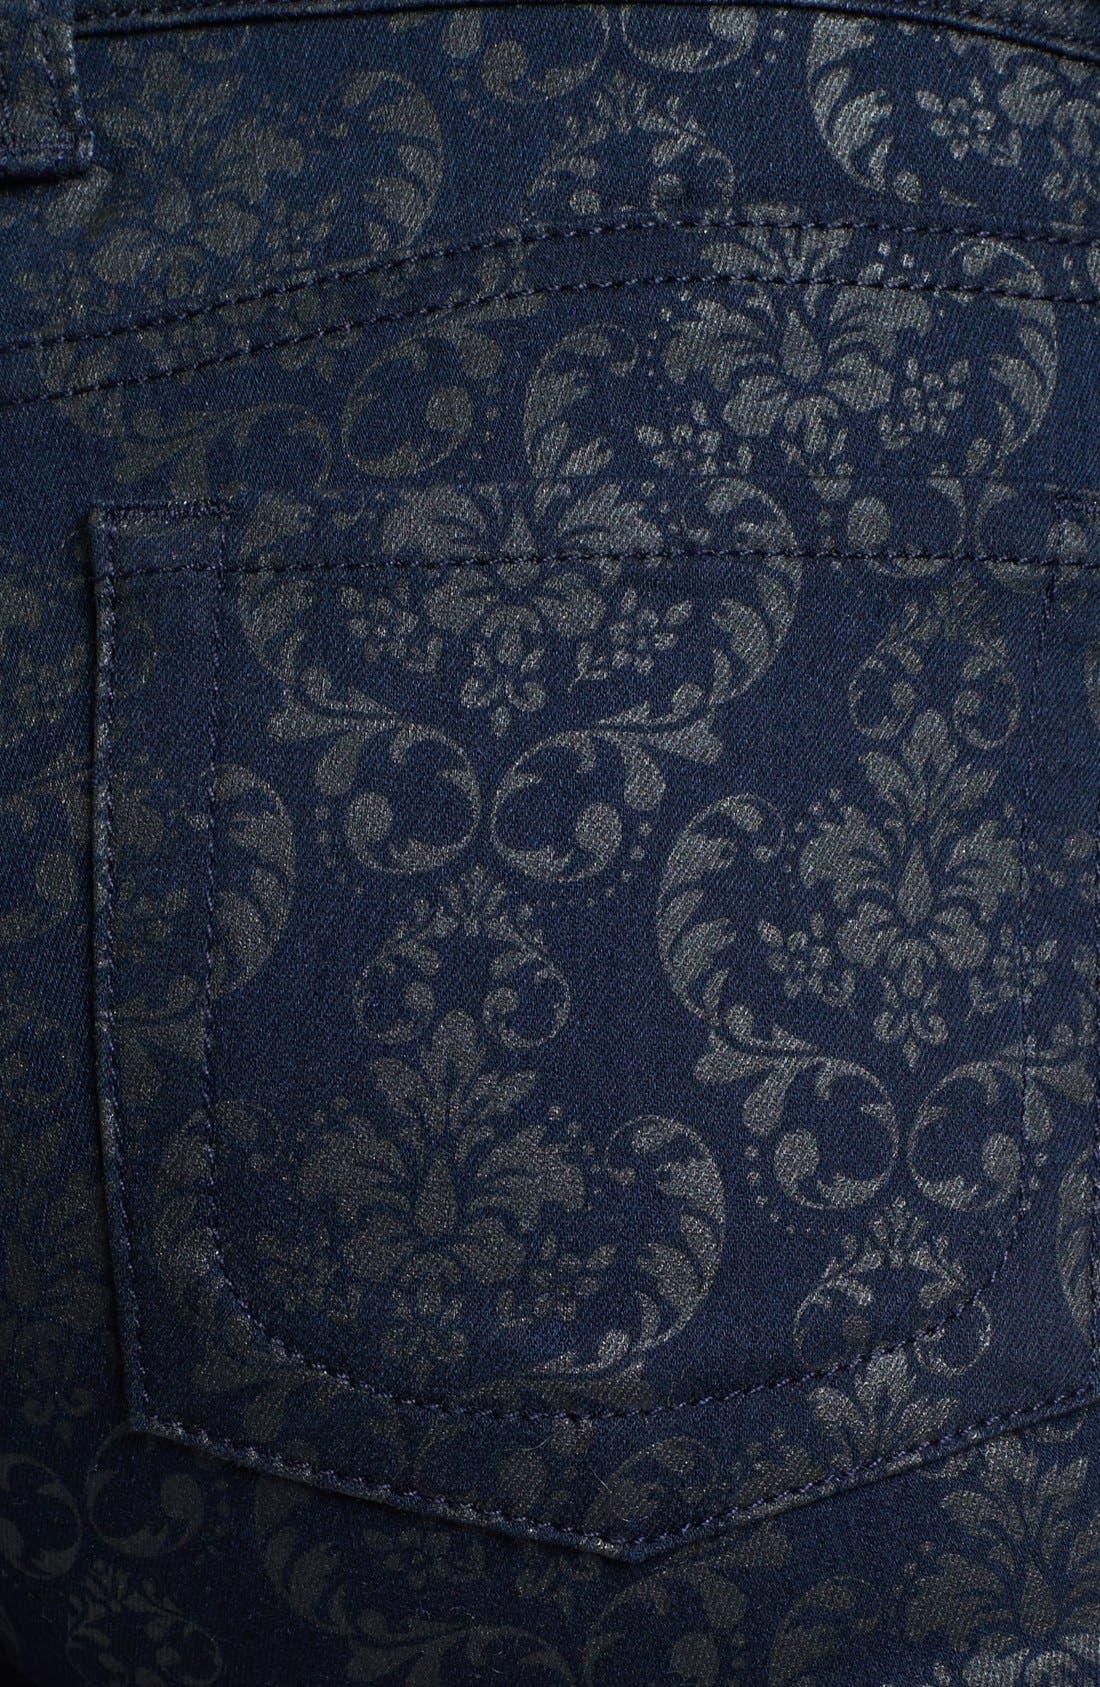 Alternate Image 3  - KUT from the Kloth 'Mia' Print Skinny Jeans (Indigo)